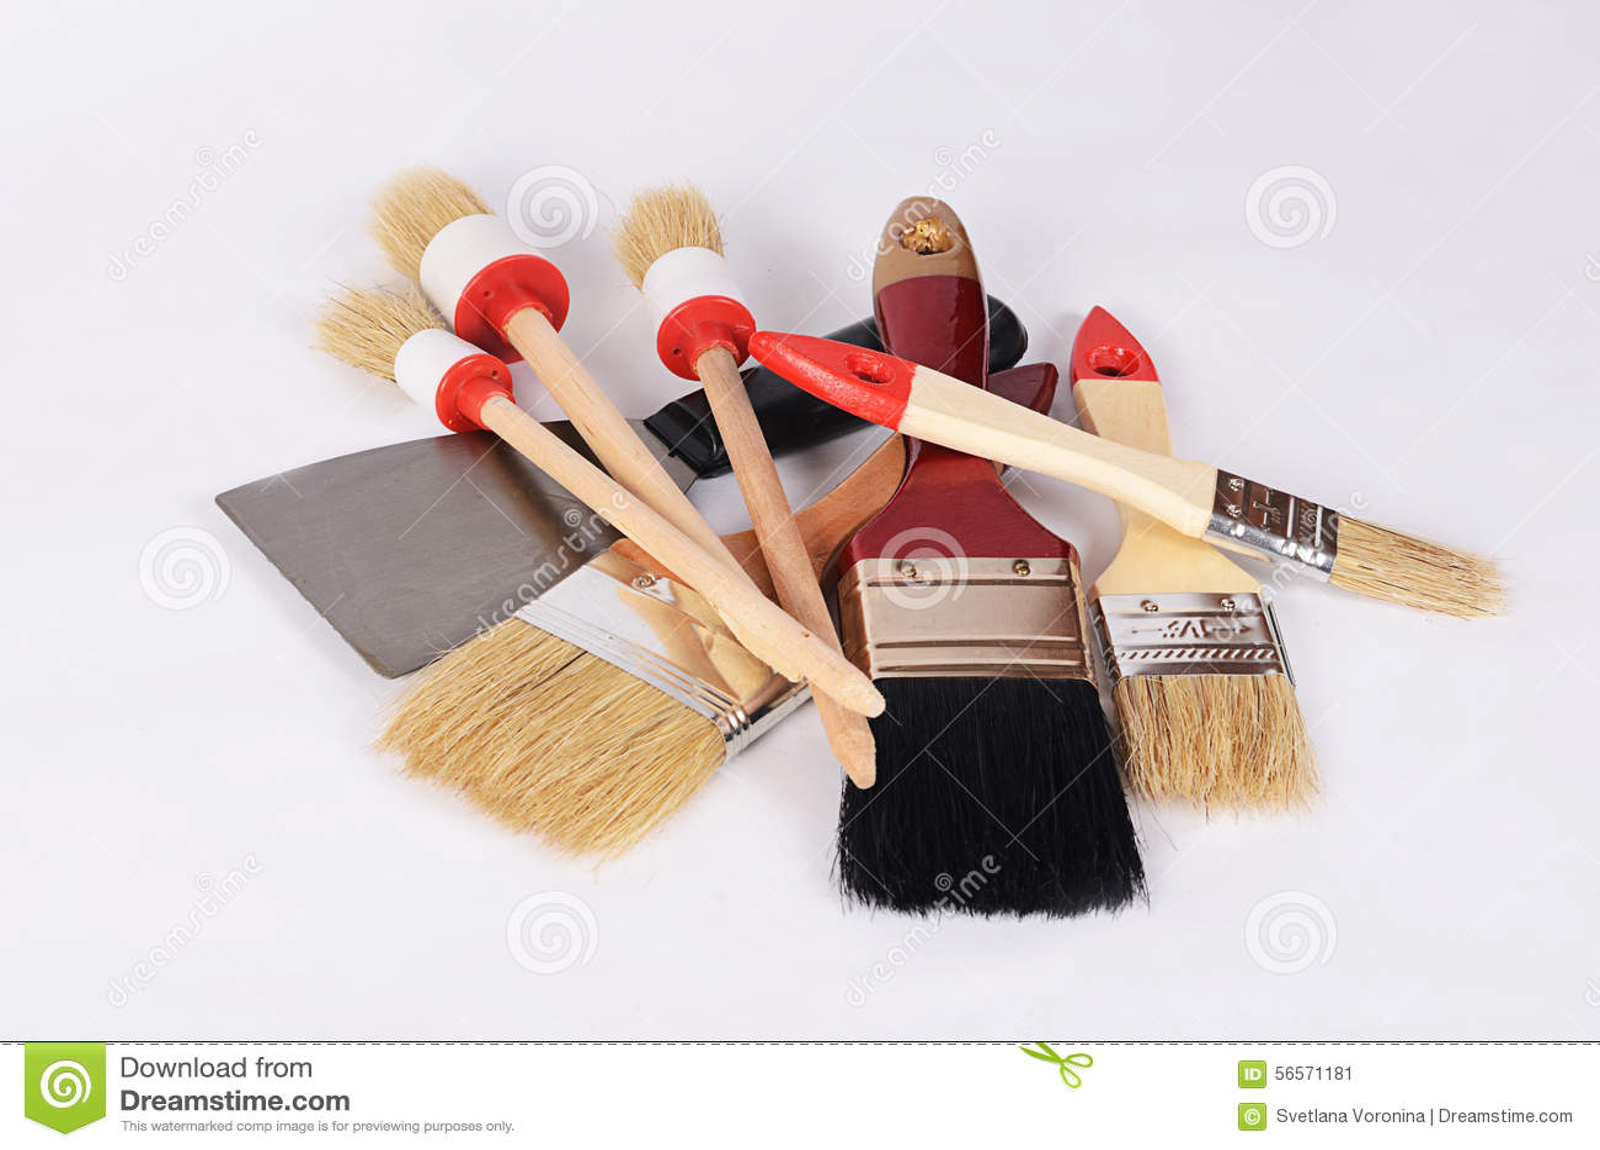 Download Άσπρισμα της βούρτσας ως υπόβαθρο Στοκ Εικόνα - εικόνα από ζωγραφική, παλέτα: 56571181